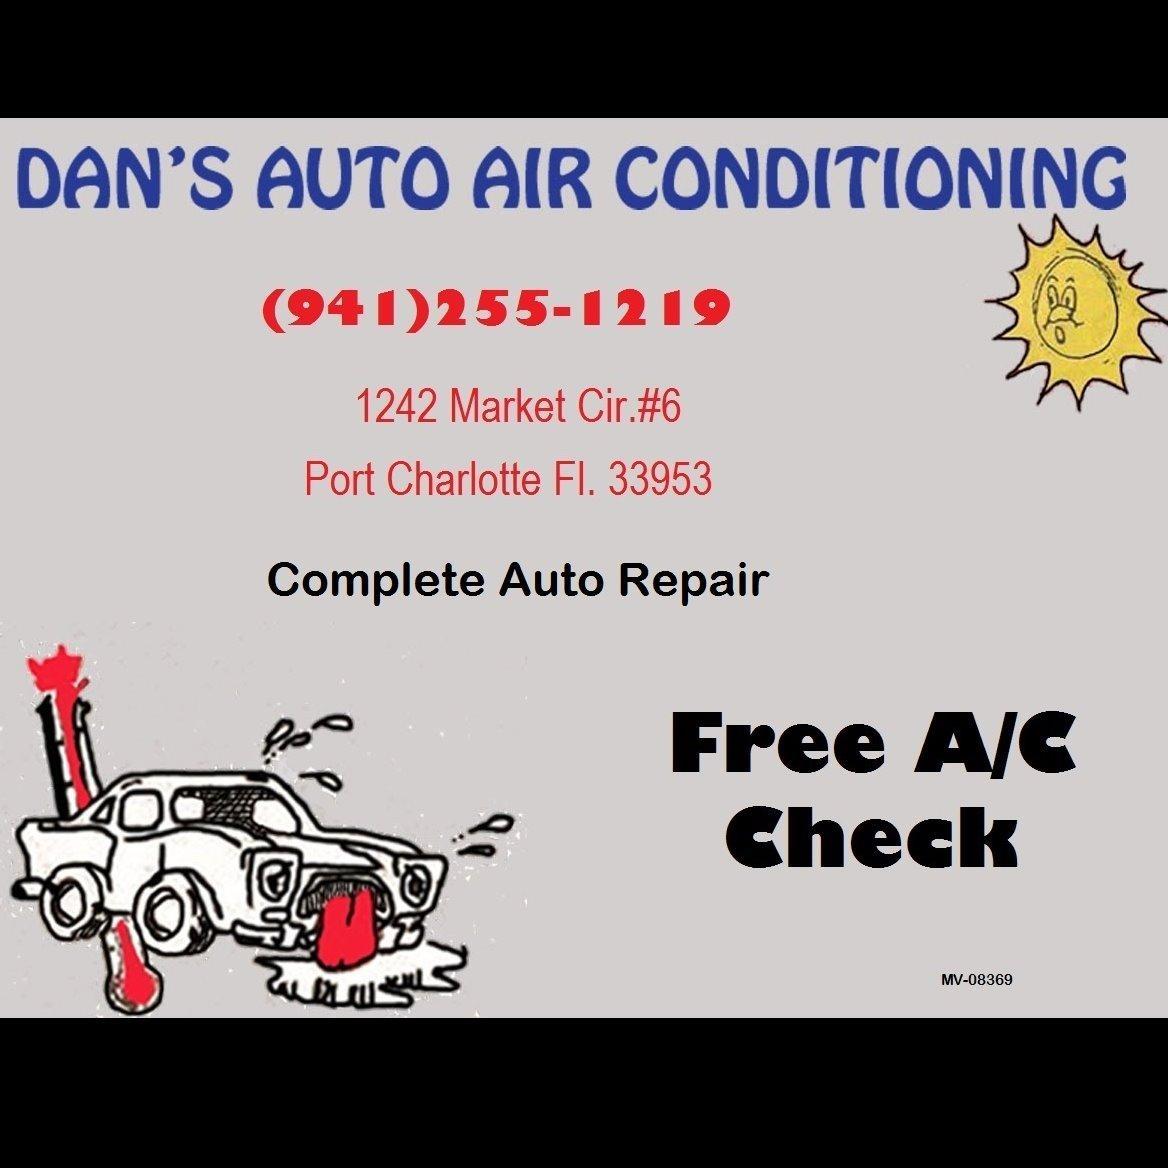 Dan's Auto & Air Conditioning